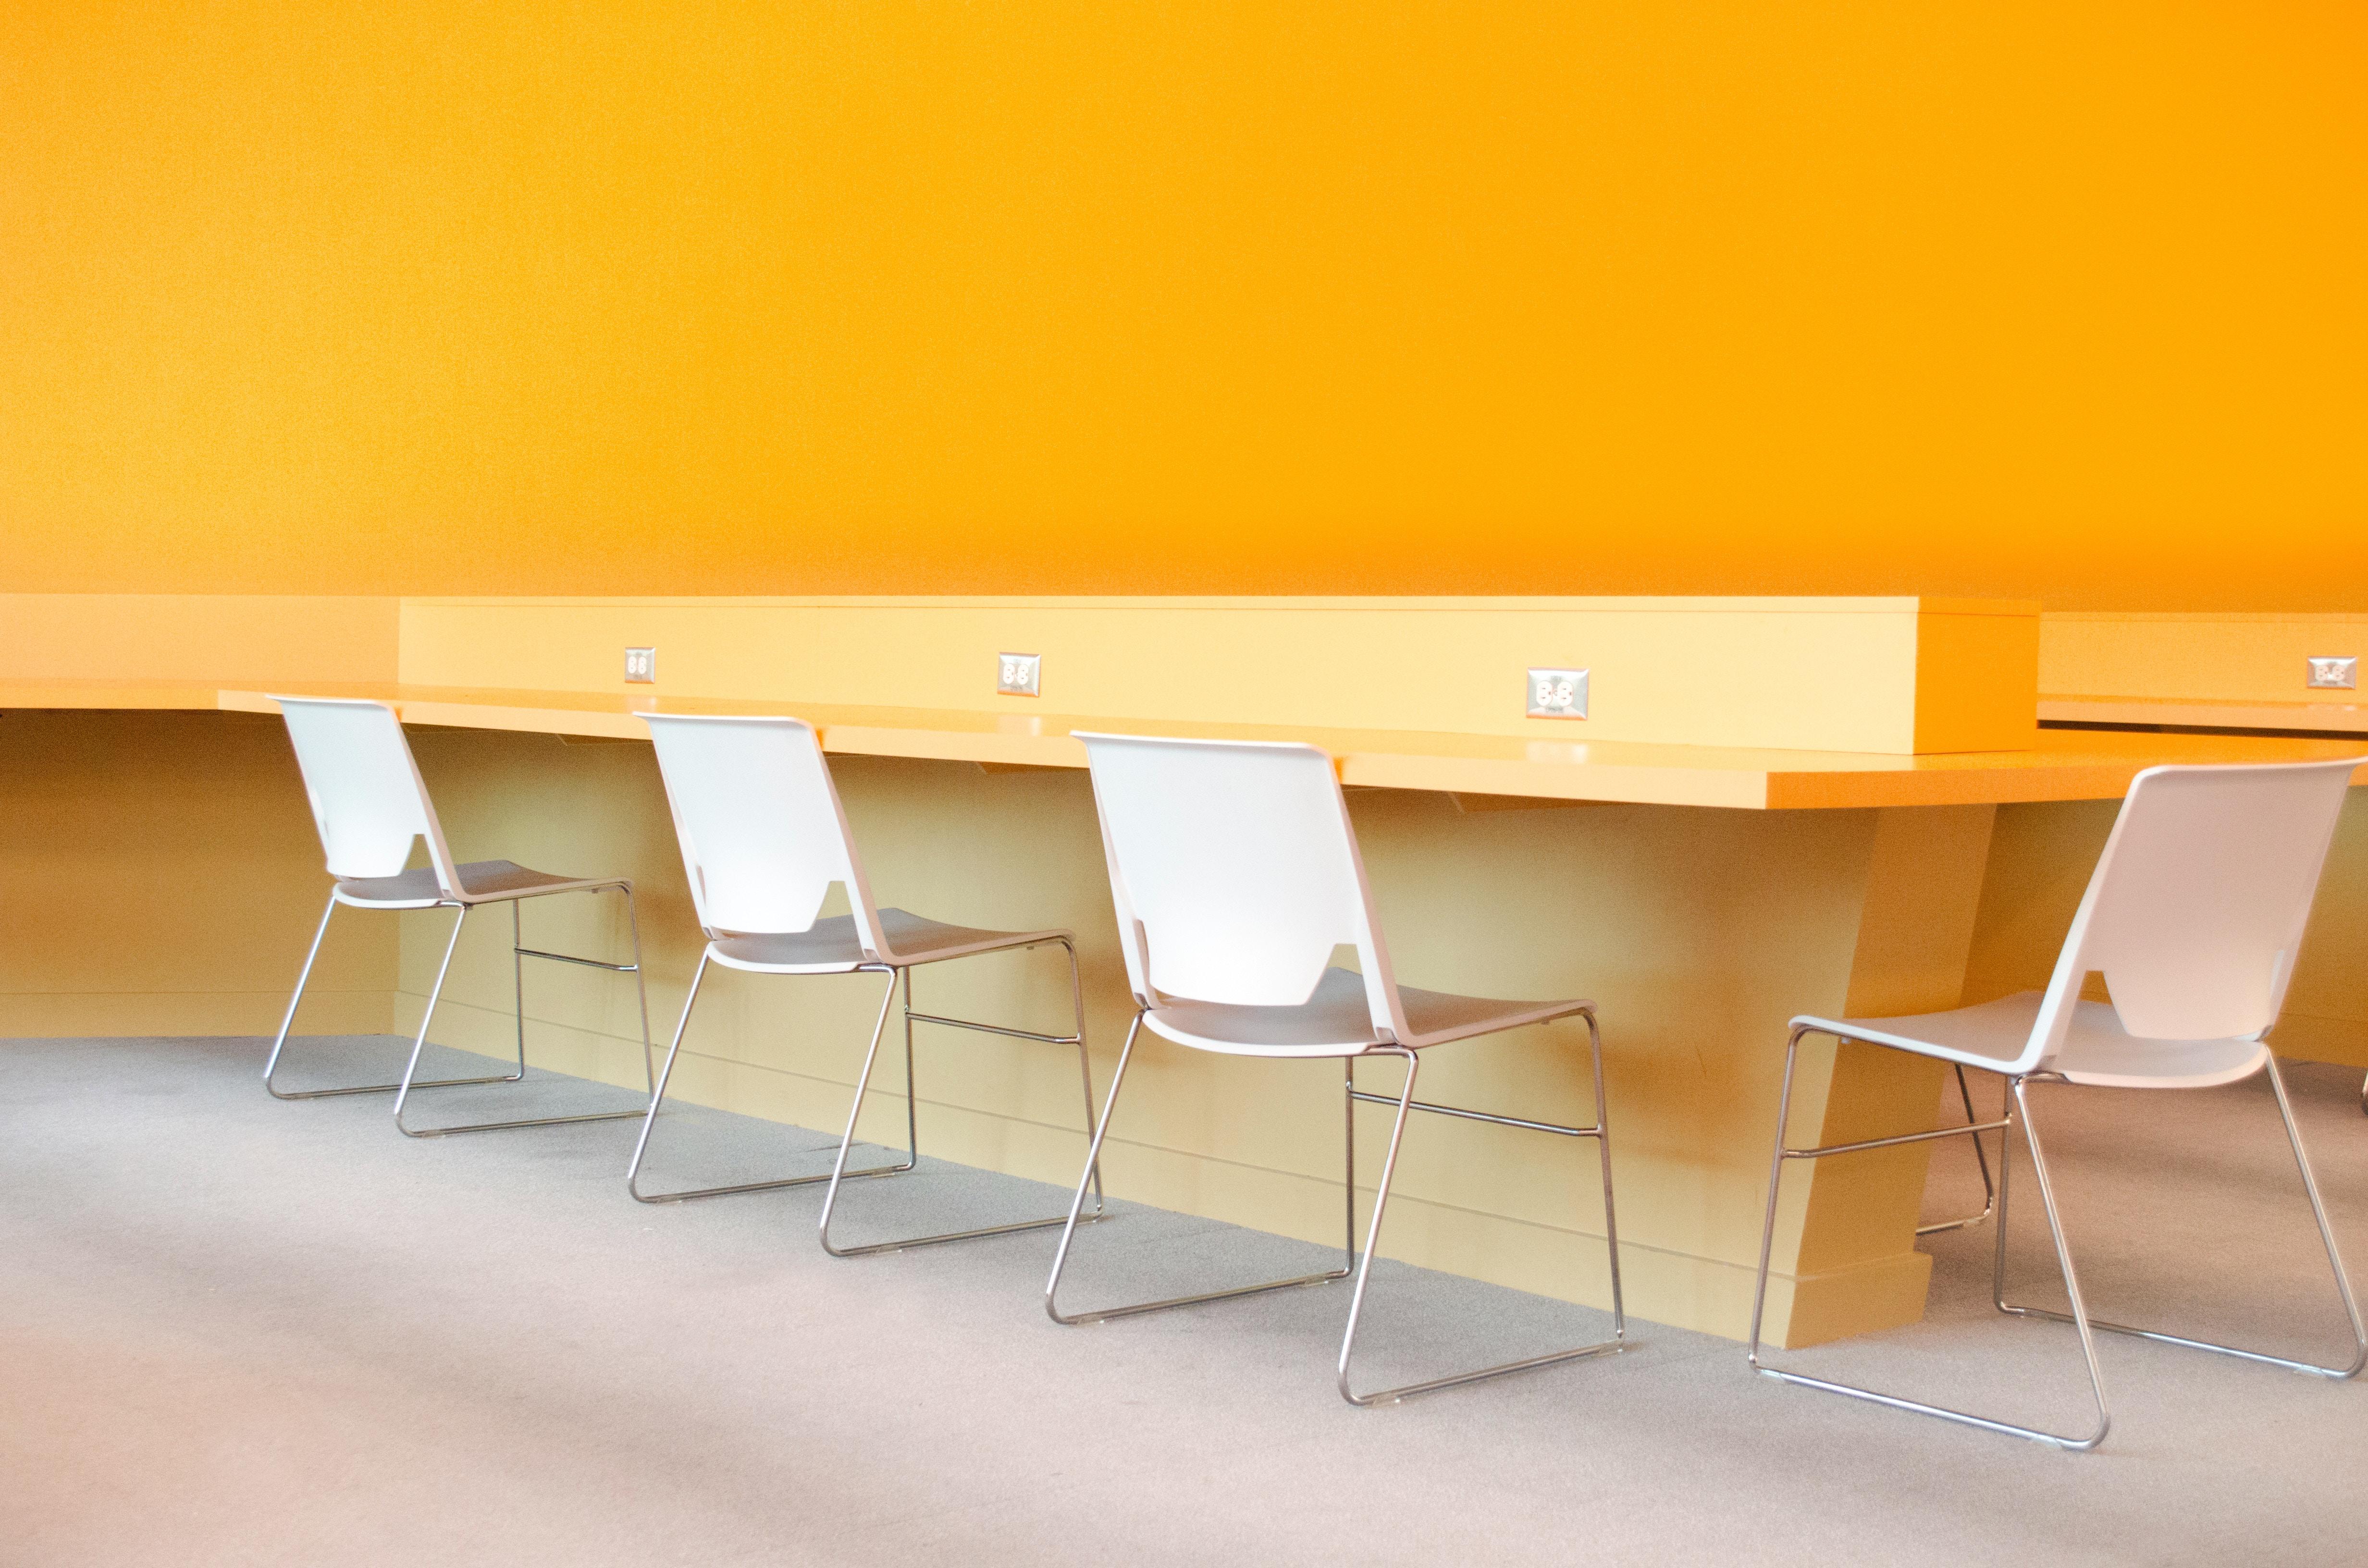 pacific-office-interiors-581359-unsplash